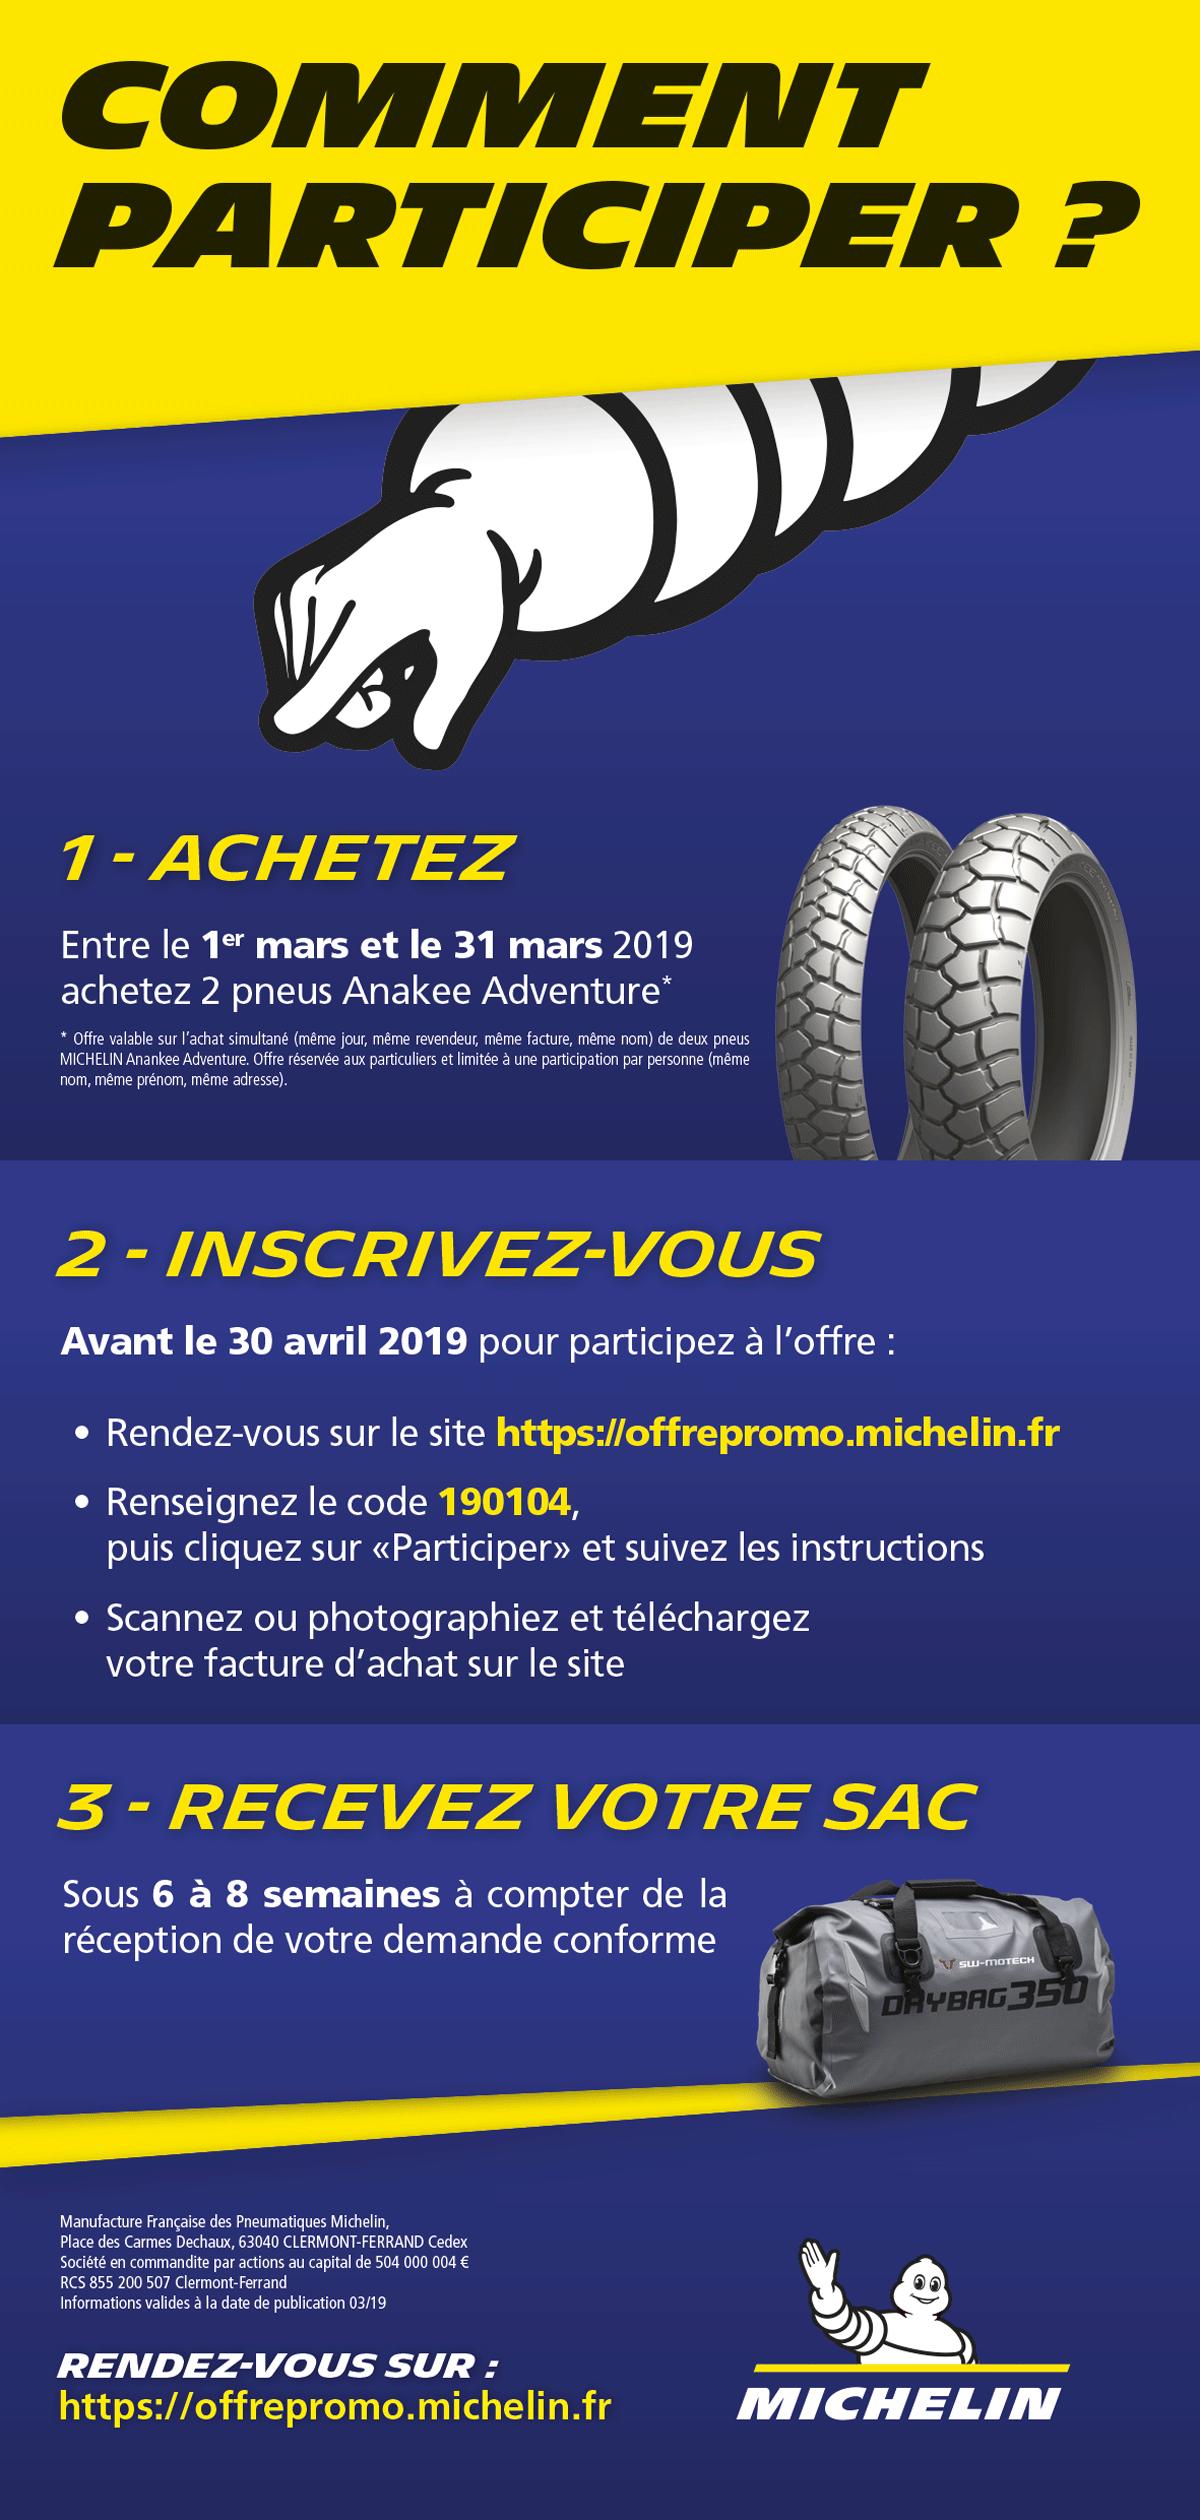 visuel ope Michelin Anakee Adventure - 1 sac SW-MOTECH offert